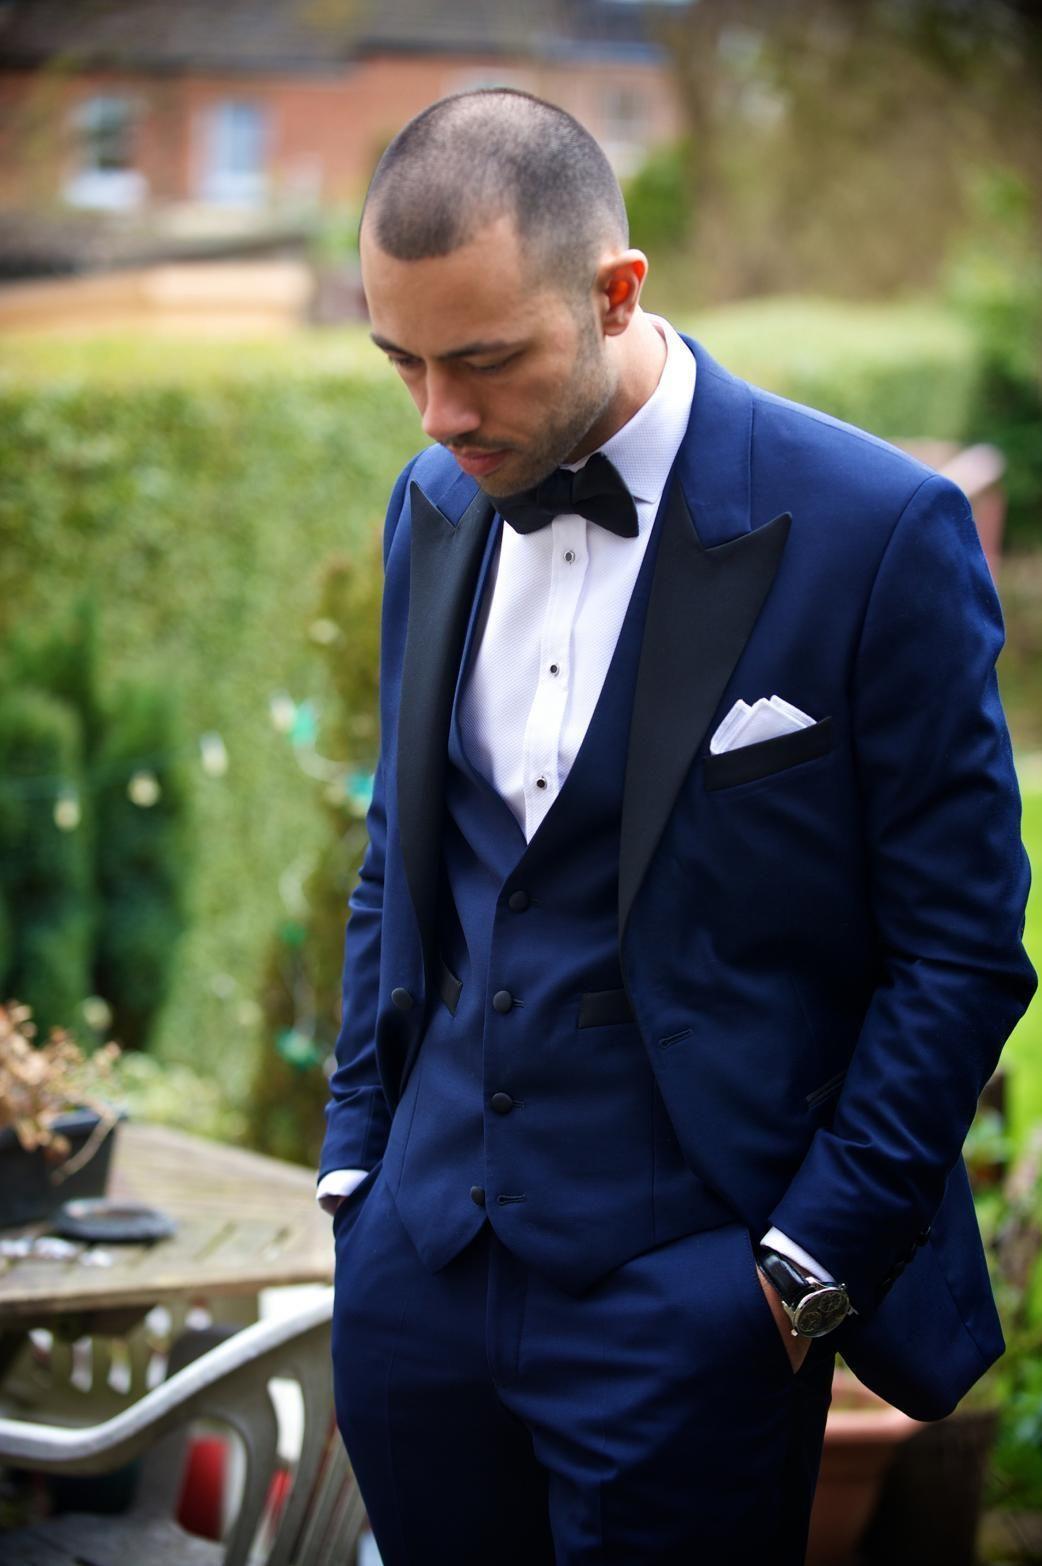 153c951e3 2015 Summer Tuxedos Notched Lapel Mens Suits Blue Mens Wedding Suits ...